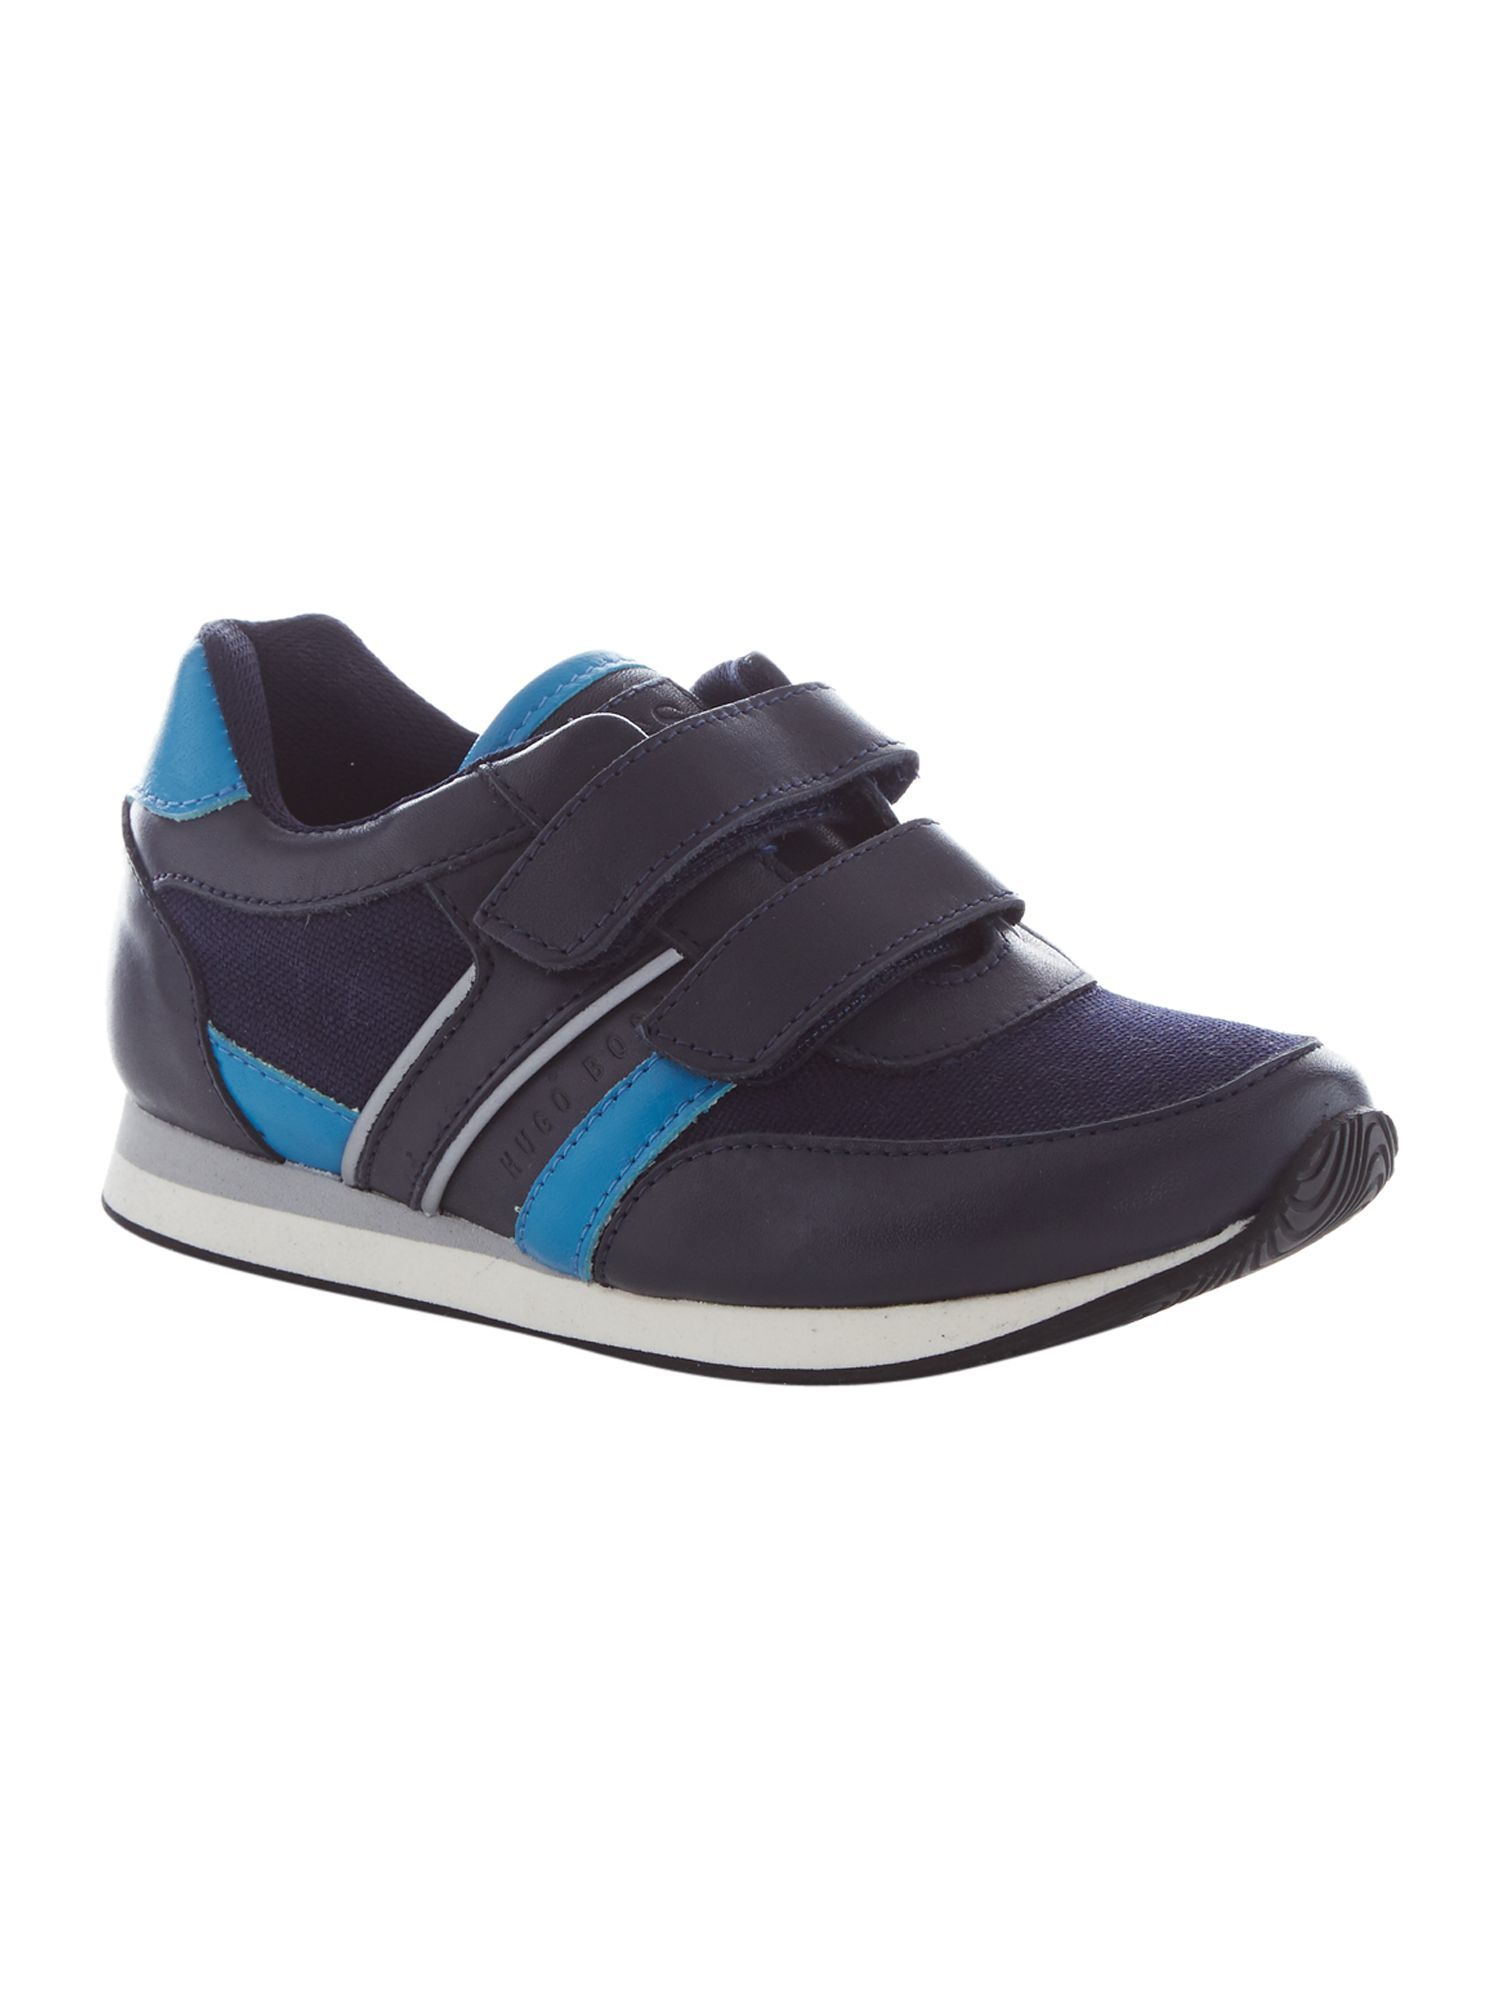 0baa644062567 Hugo Boss Boys Velcro Trainers